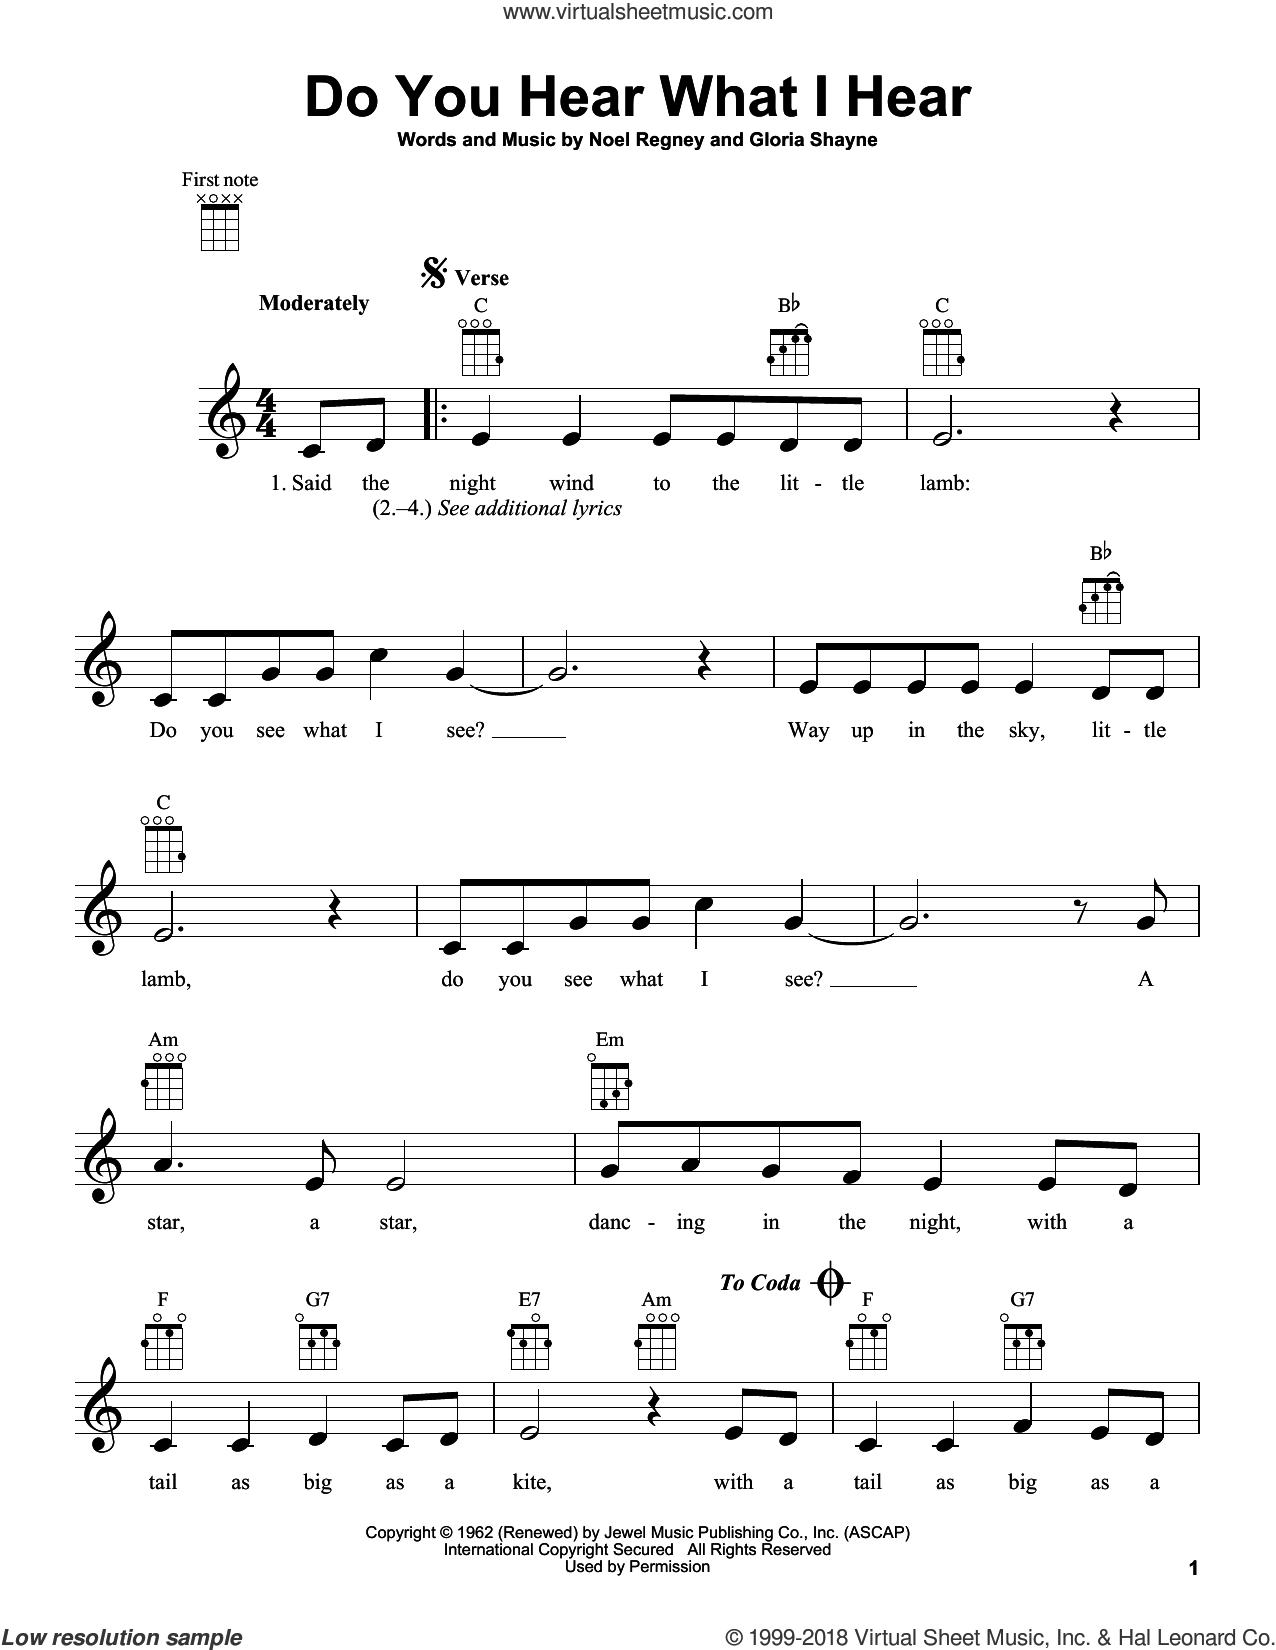 Do You Hear What I Hear sheet music for ukulele by Gloria Shayne, Carole King, Carrie Underwood and Noel Regney, intermediate skill level